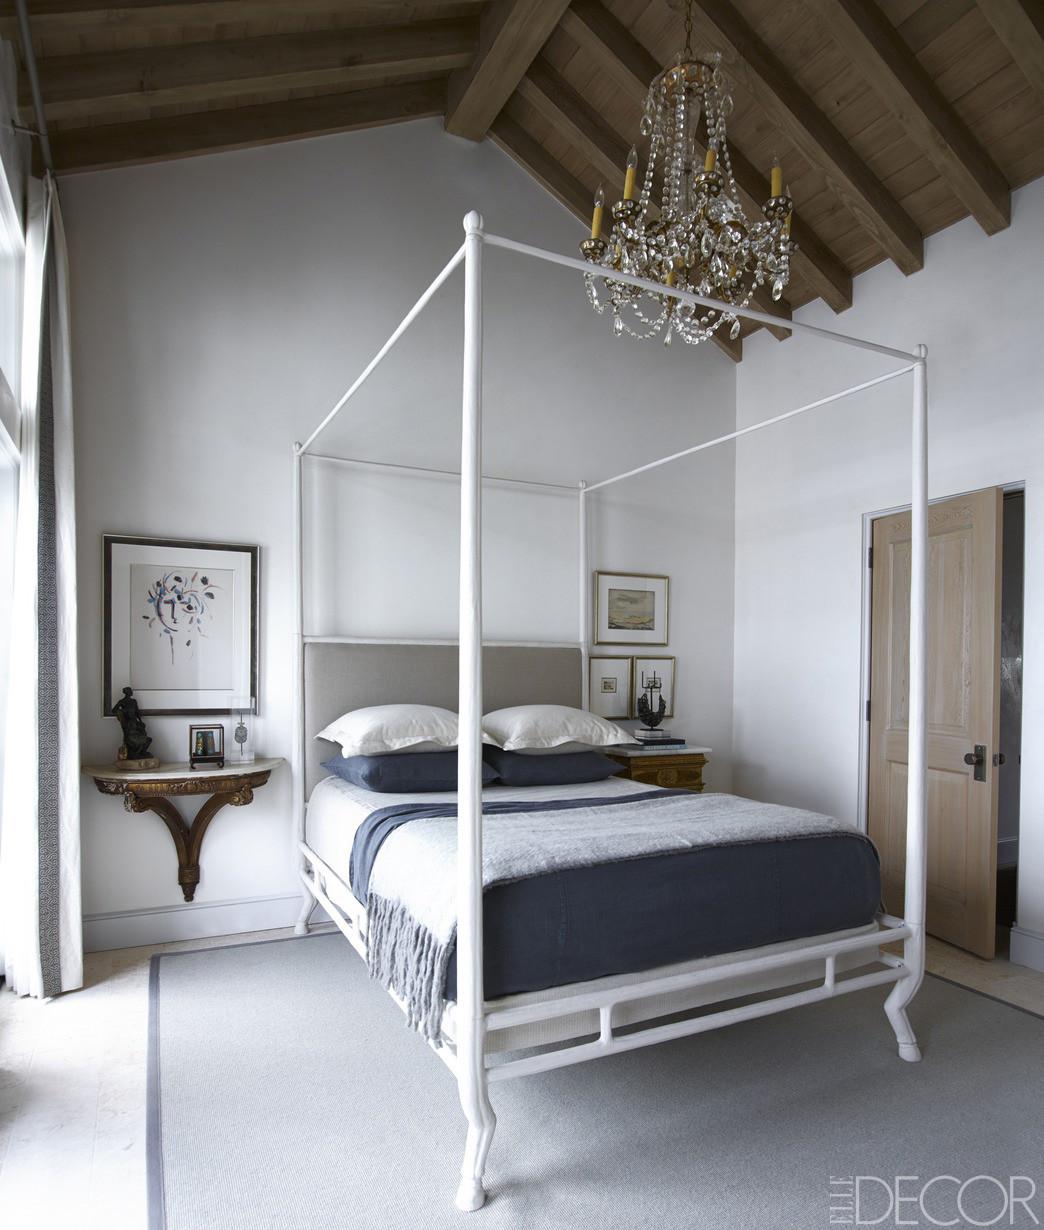 Elle Decor Bedroom Best Of 100 Bedroom Decorating Ideas & Designs Elle Decor